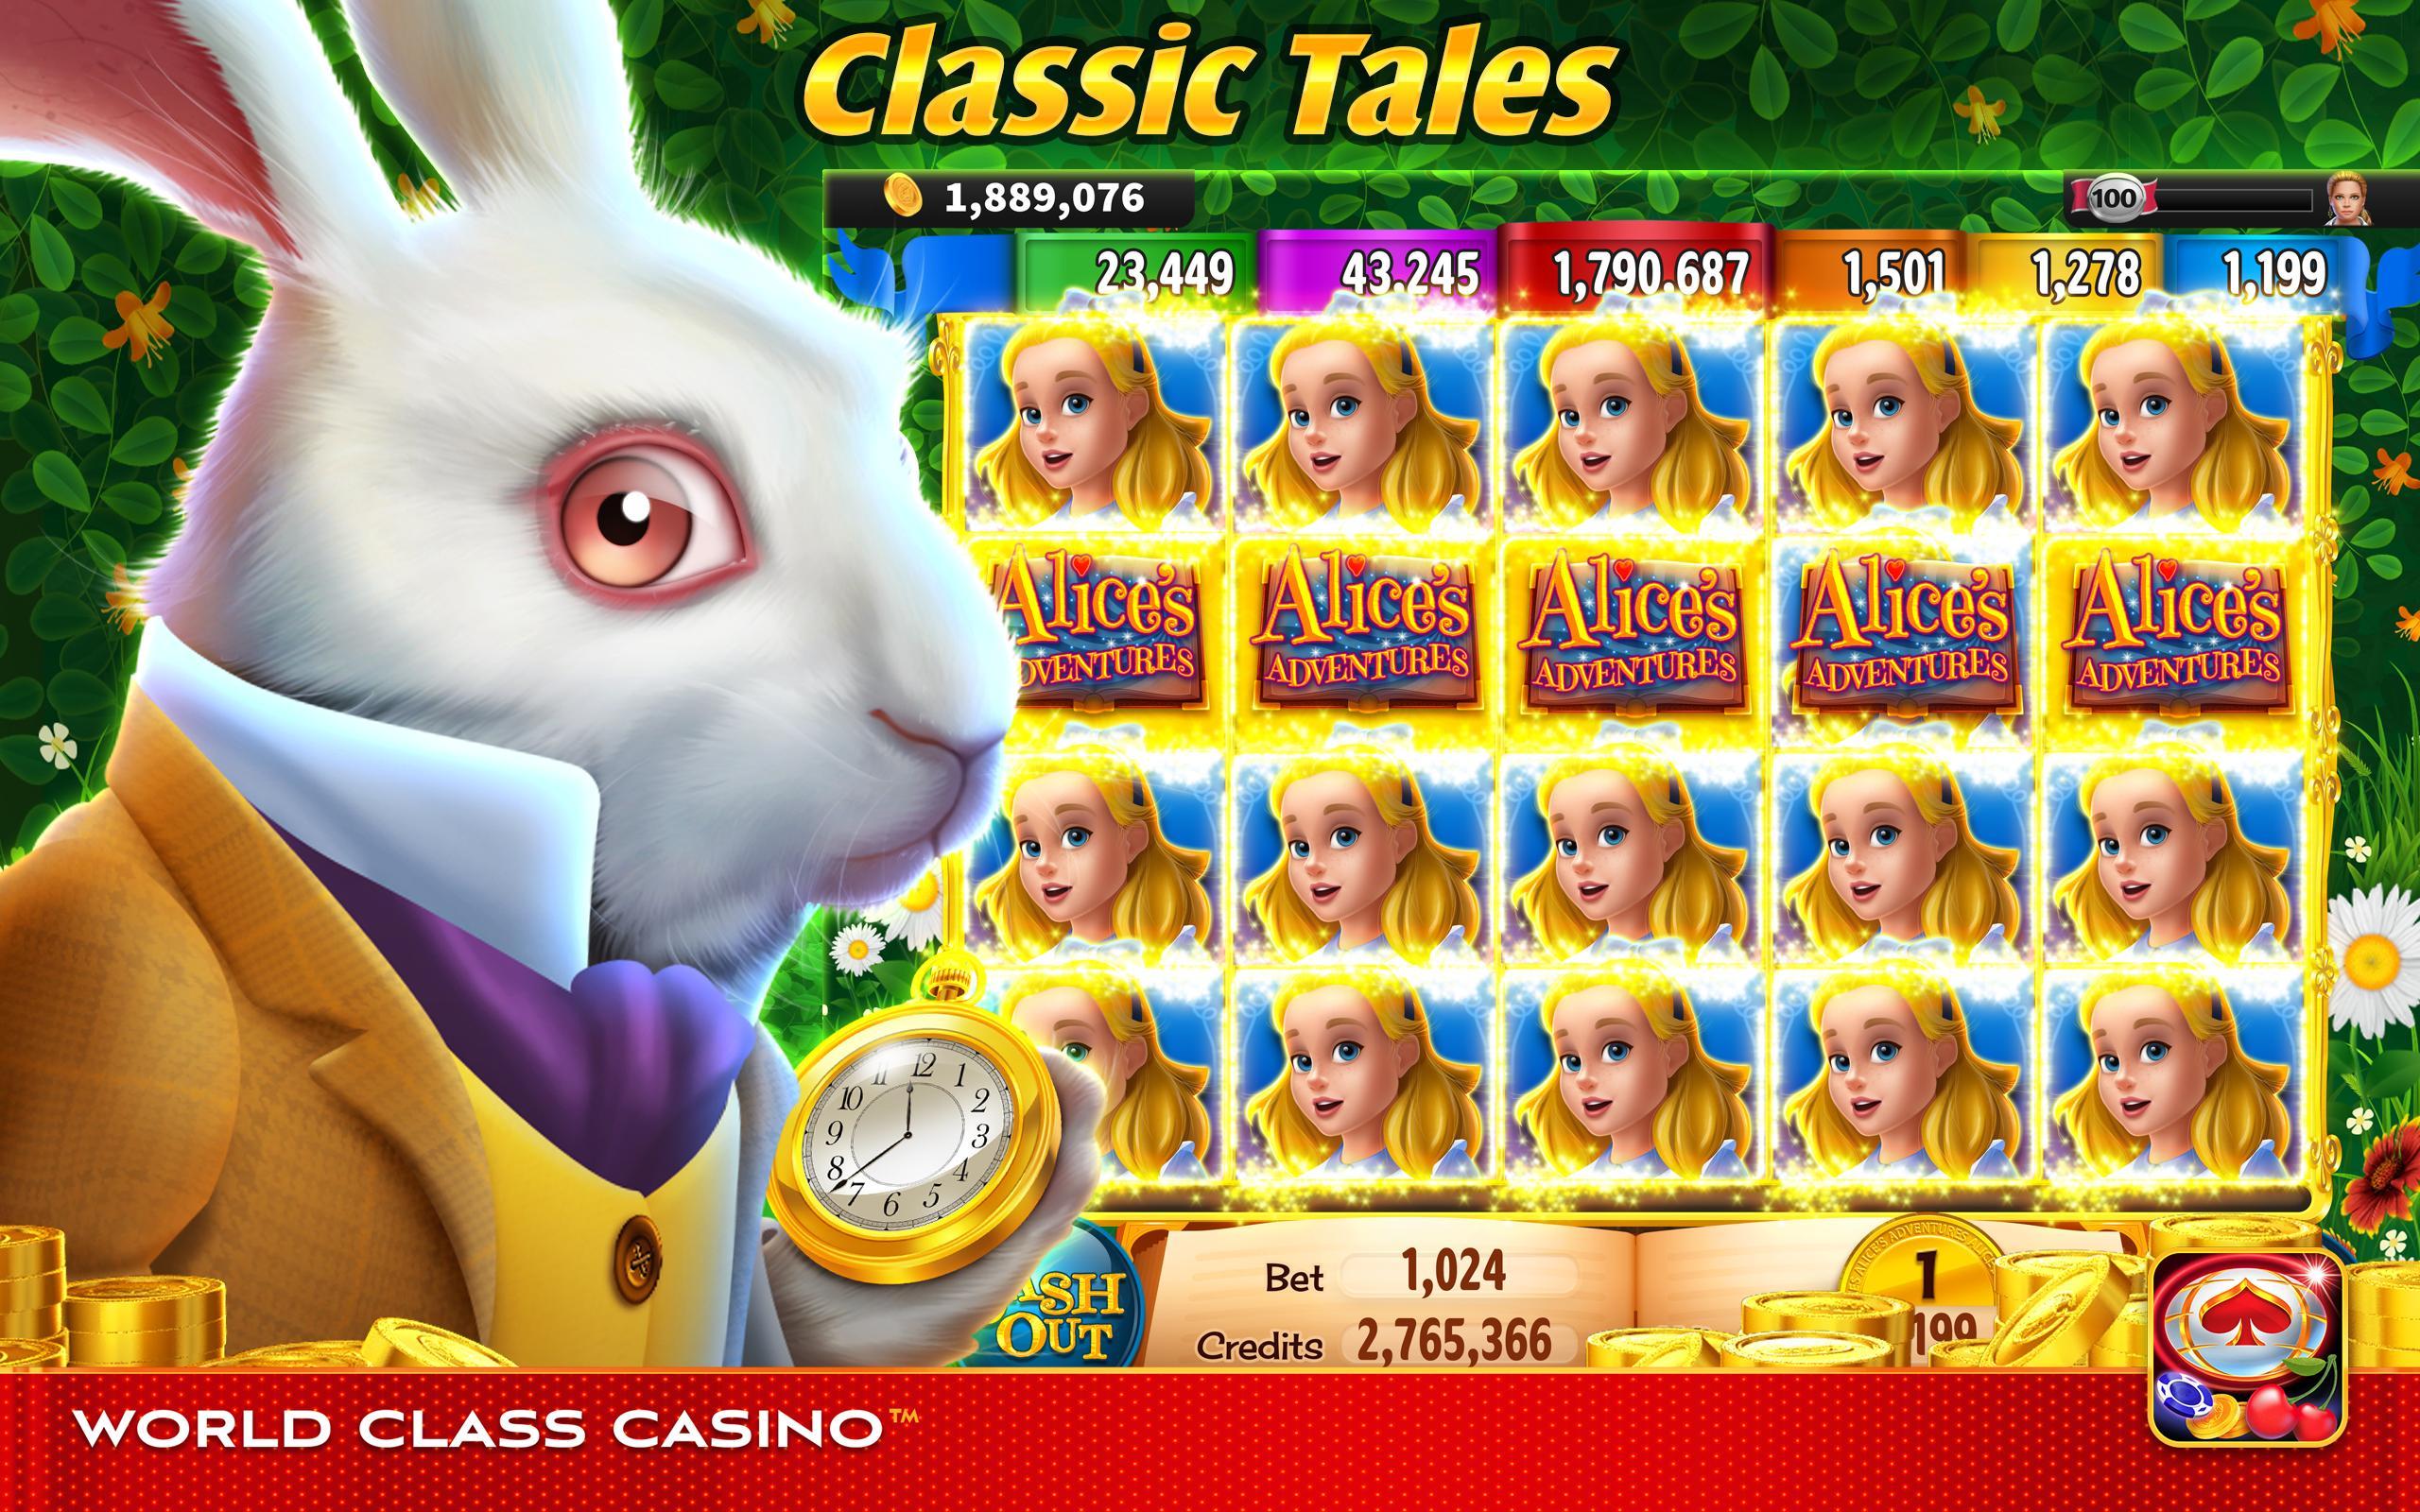 World Class Casino Slots, Blackjack & Poker Room 8.0.4 Screenshot 2